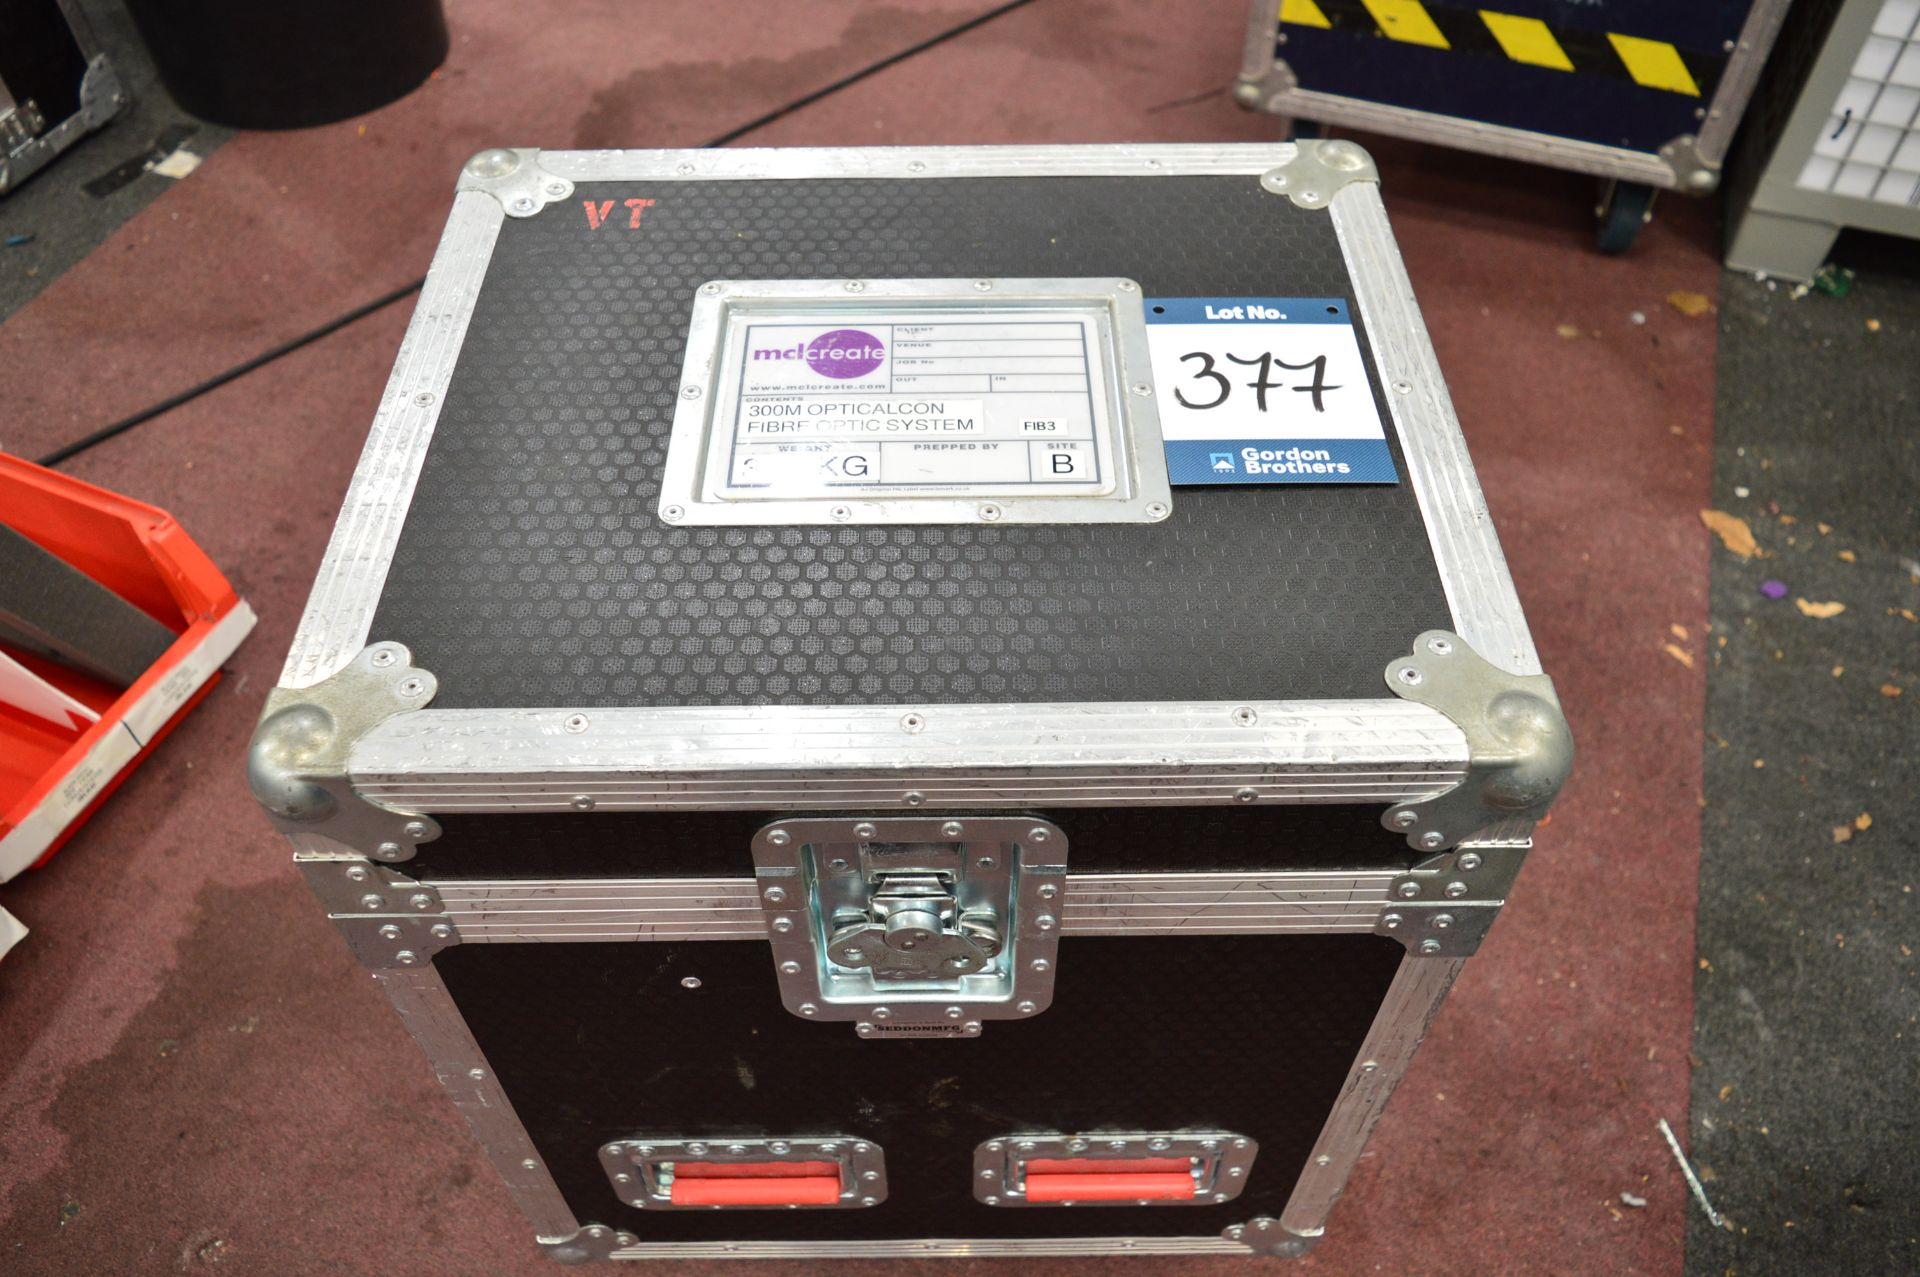 Lot 377 - NuTrek, Optic Alcon fibre optic system comprising